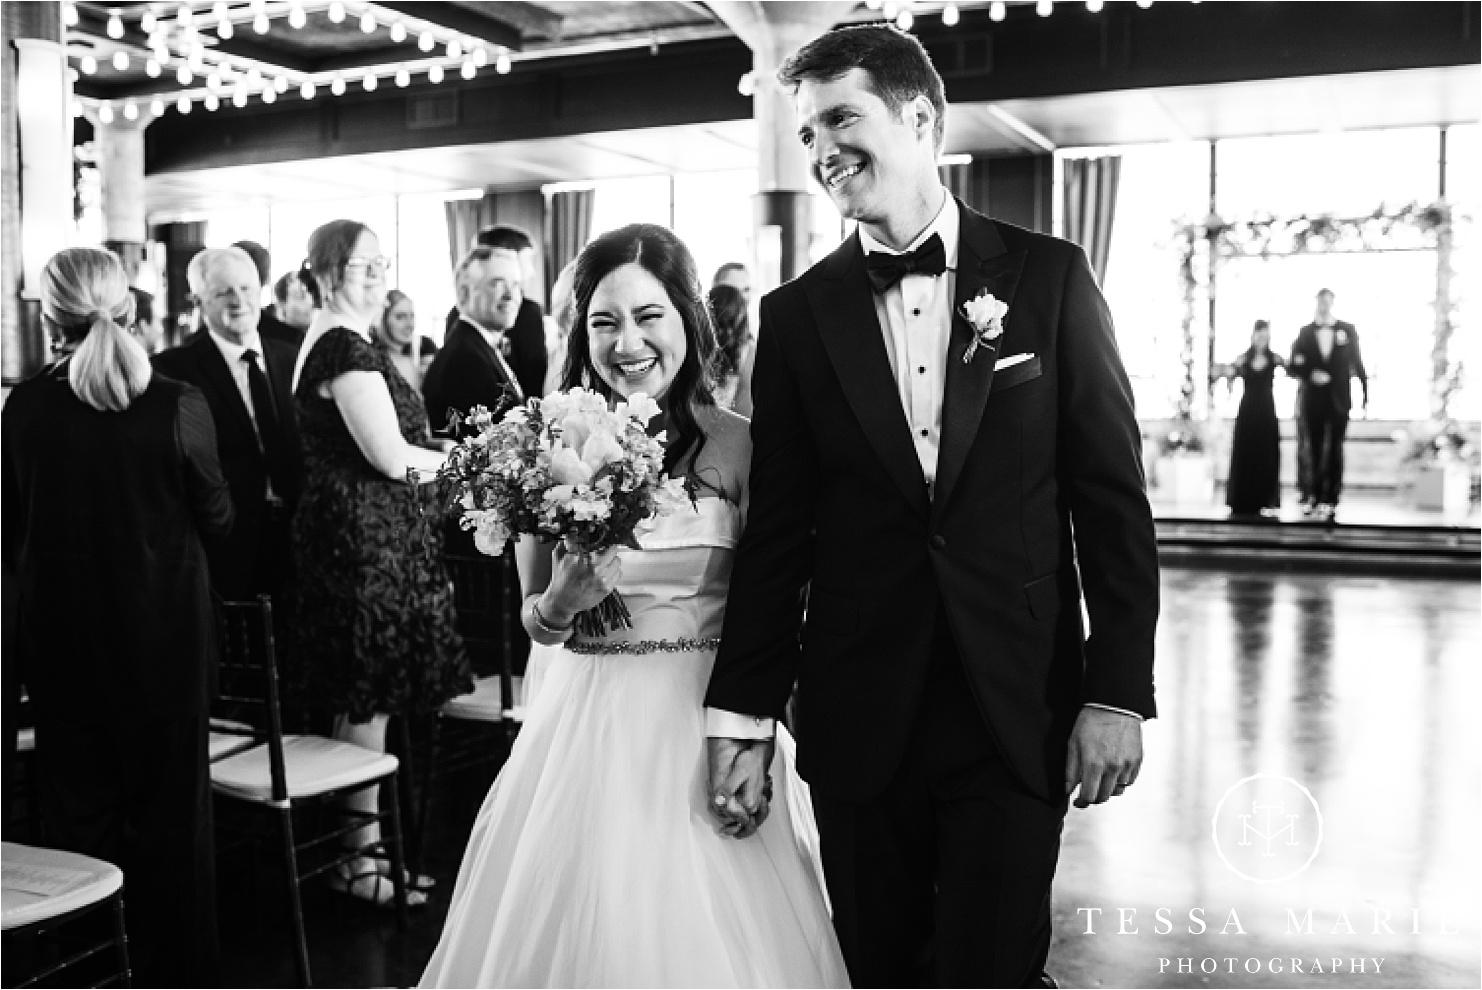 Tessa_marie_weddings_houston_wedding_photographer_The_astorian_0125.jpg